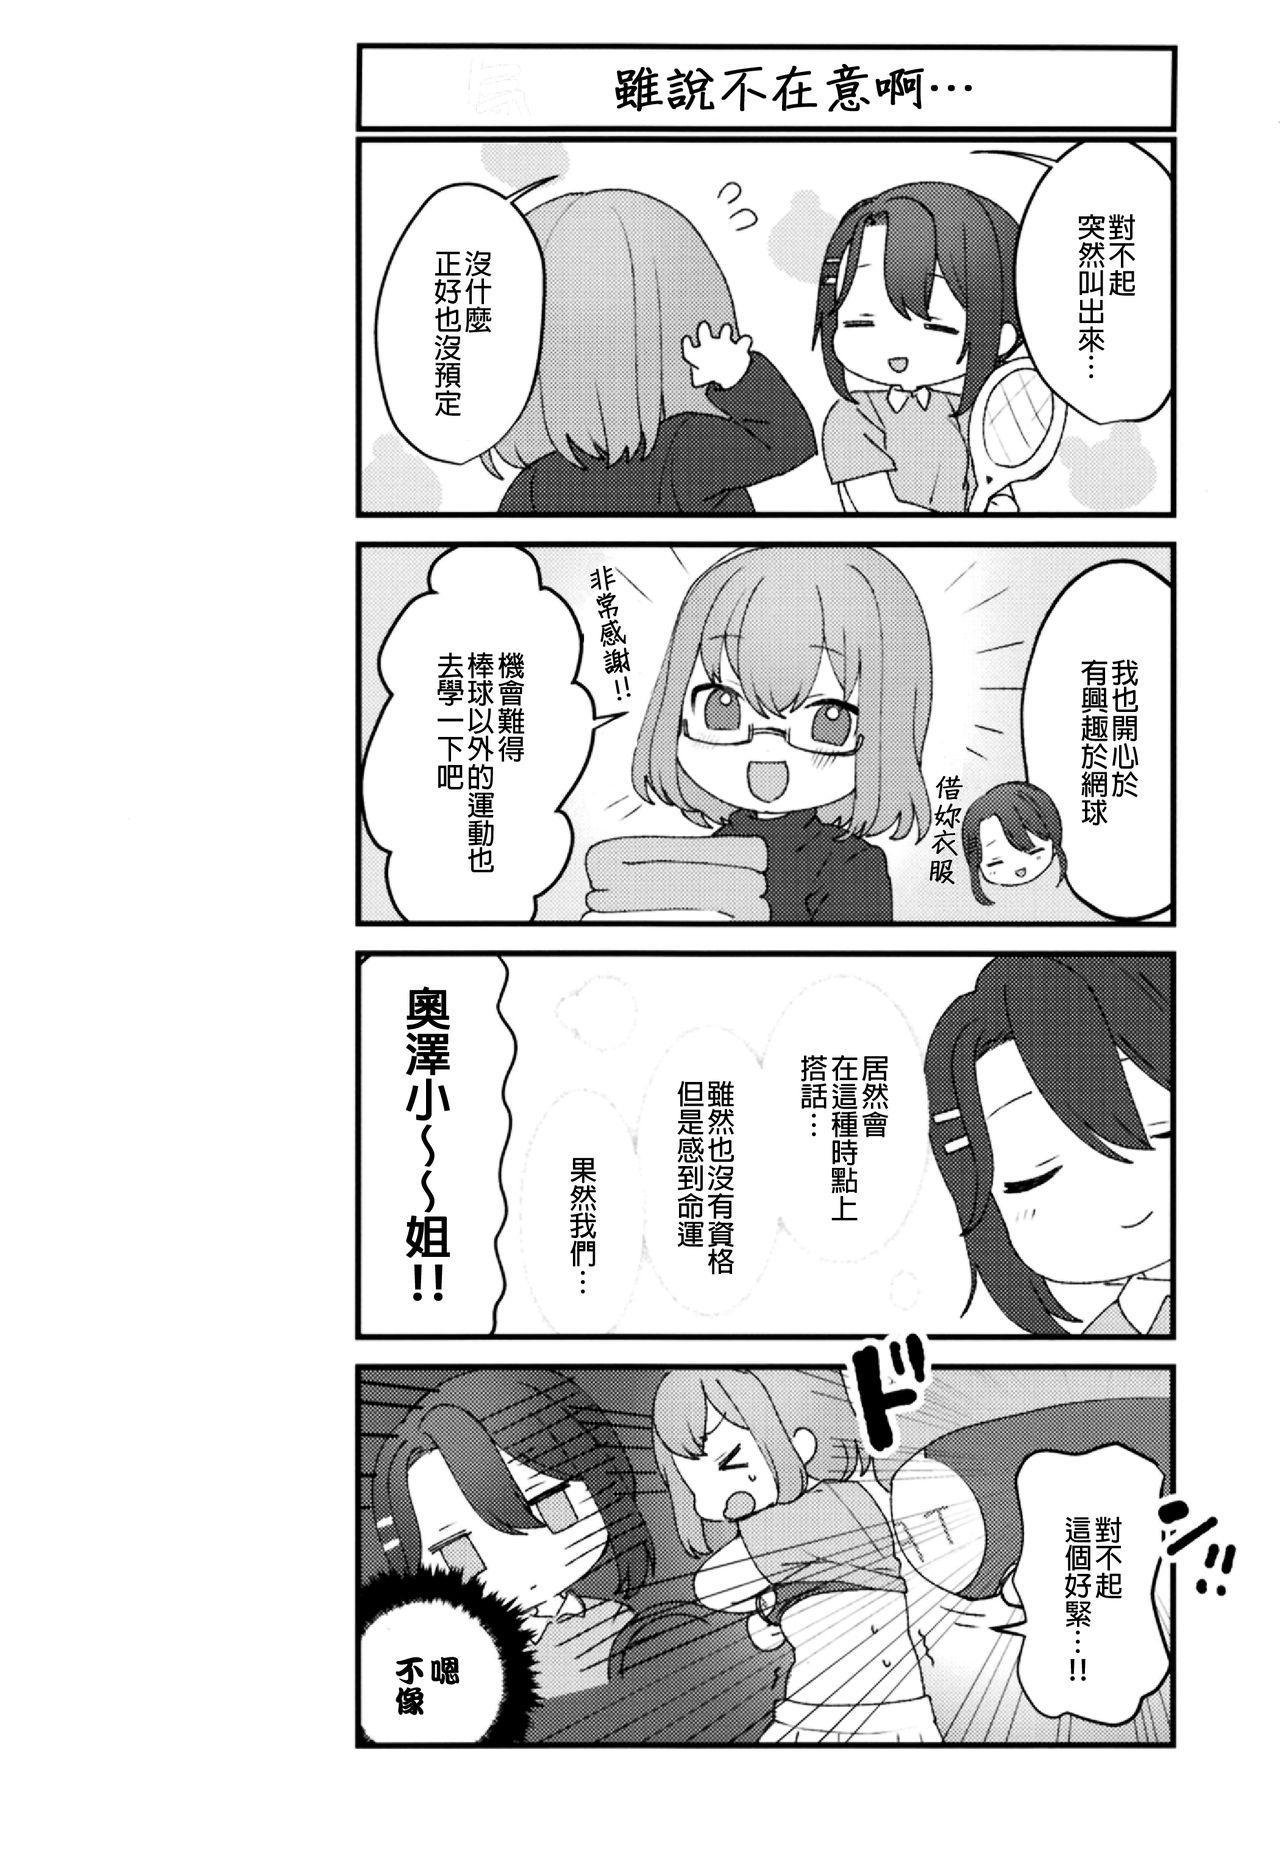 Kimi to Kirakira | 與妳閃閃發光 2